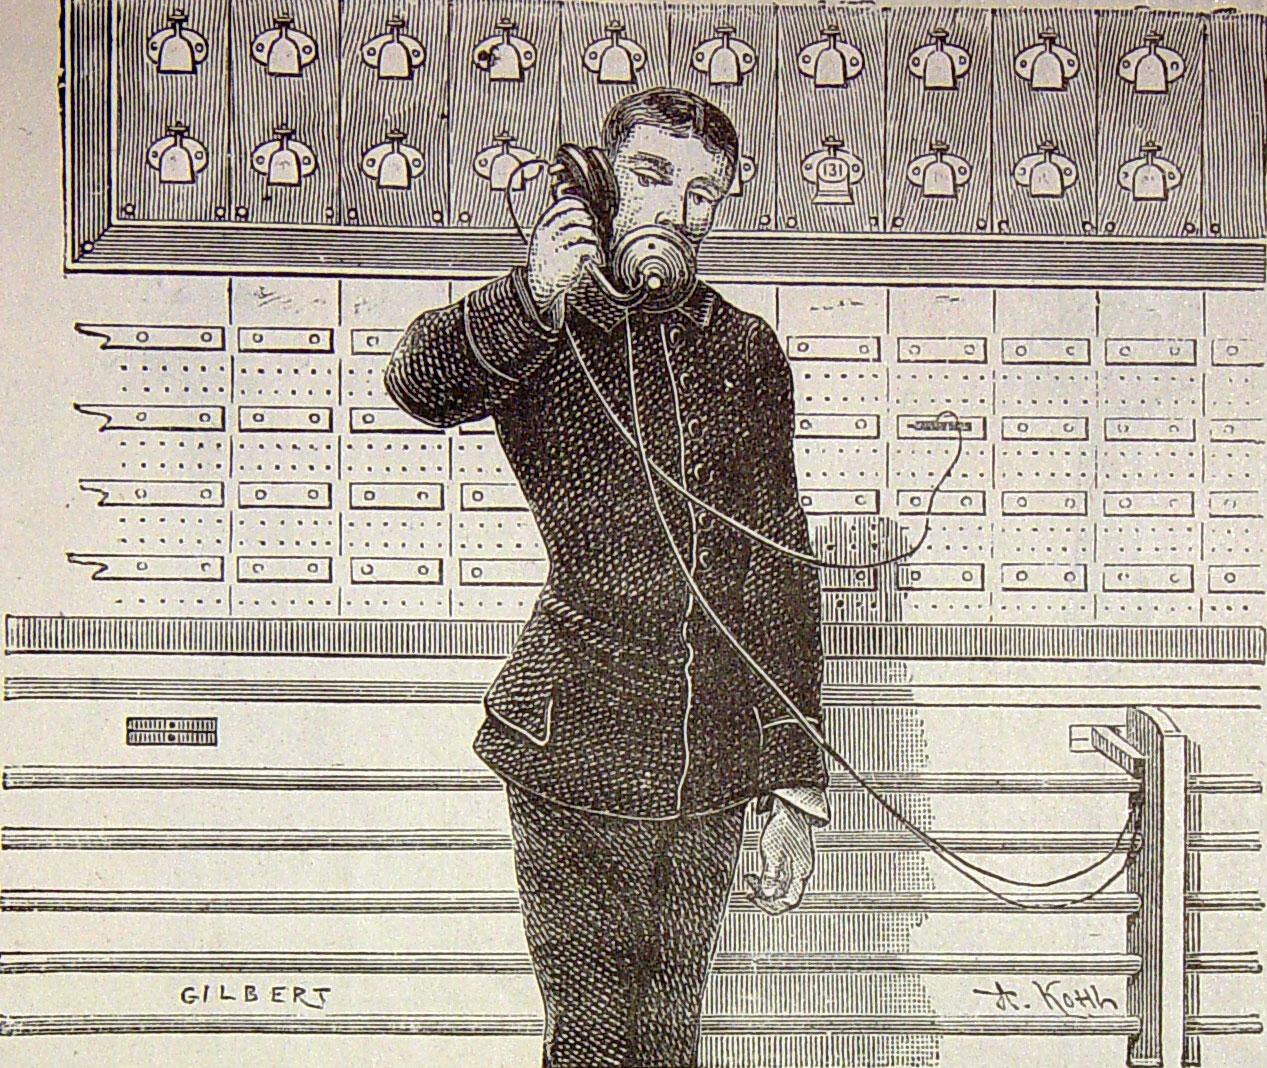 106251, comunicaciones corporativas